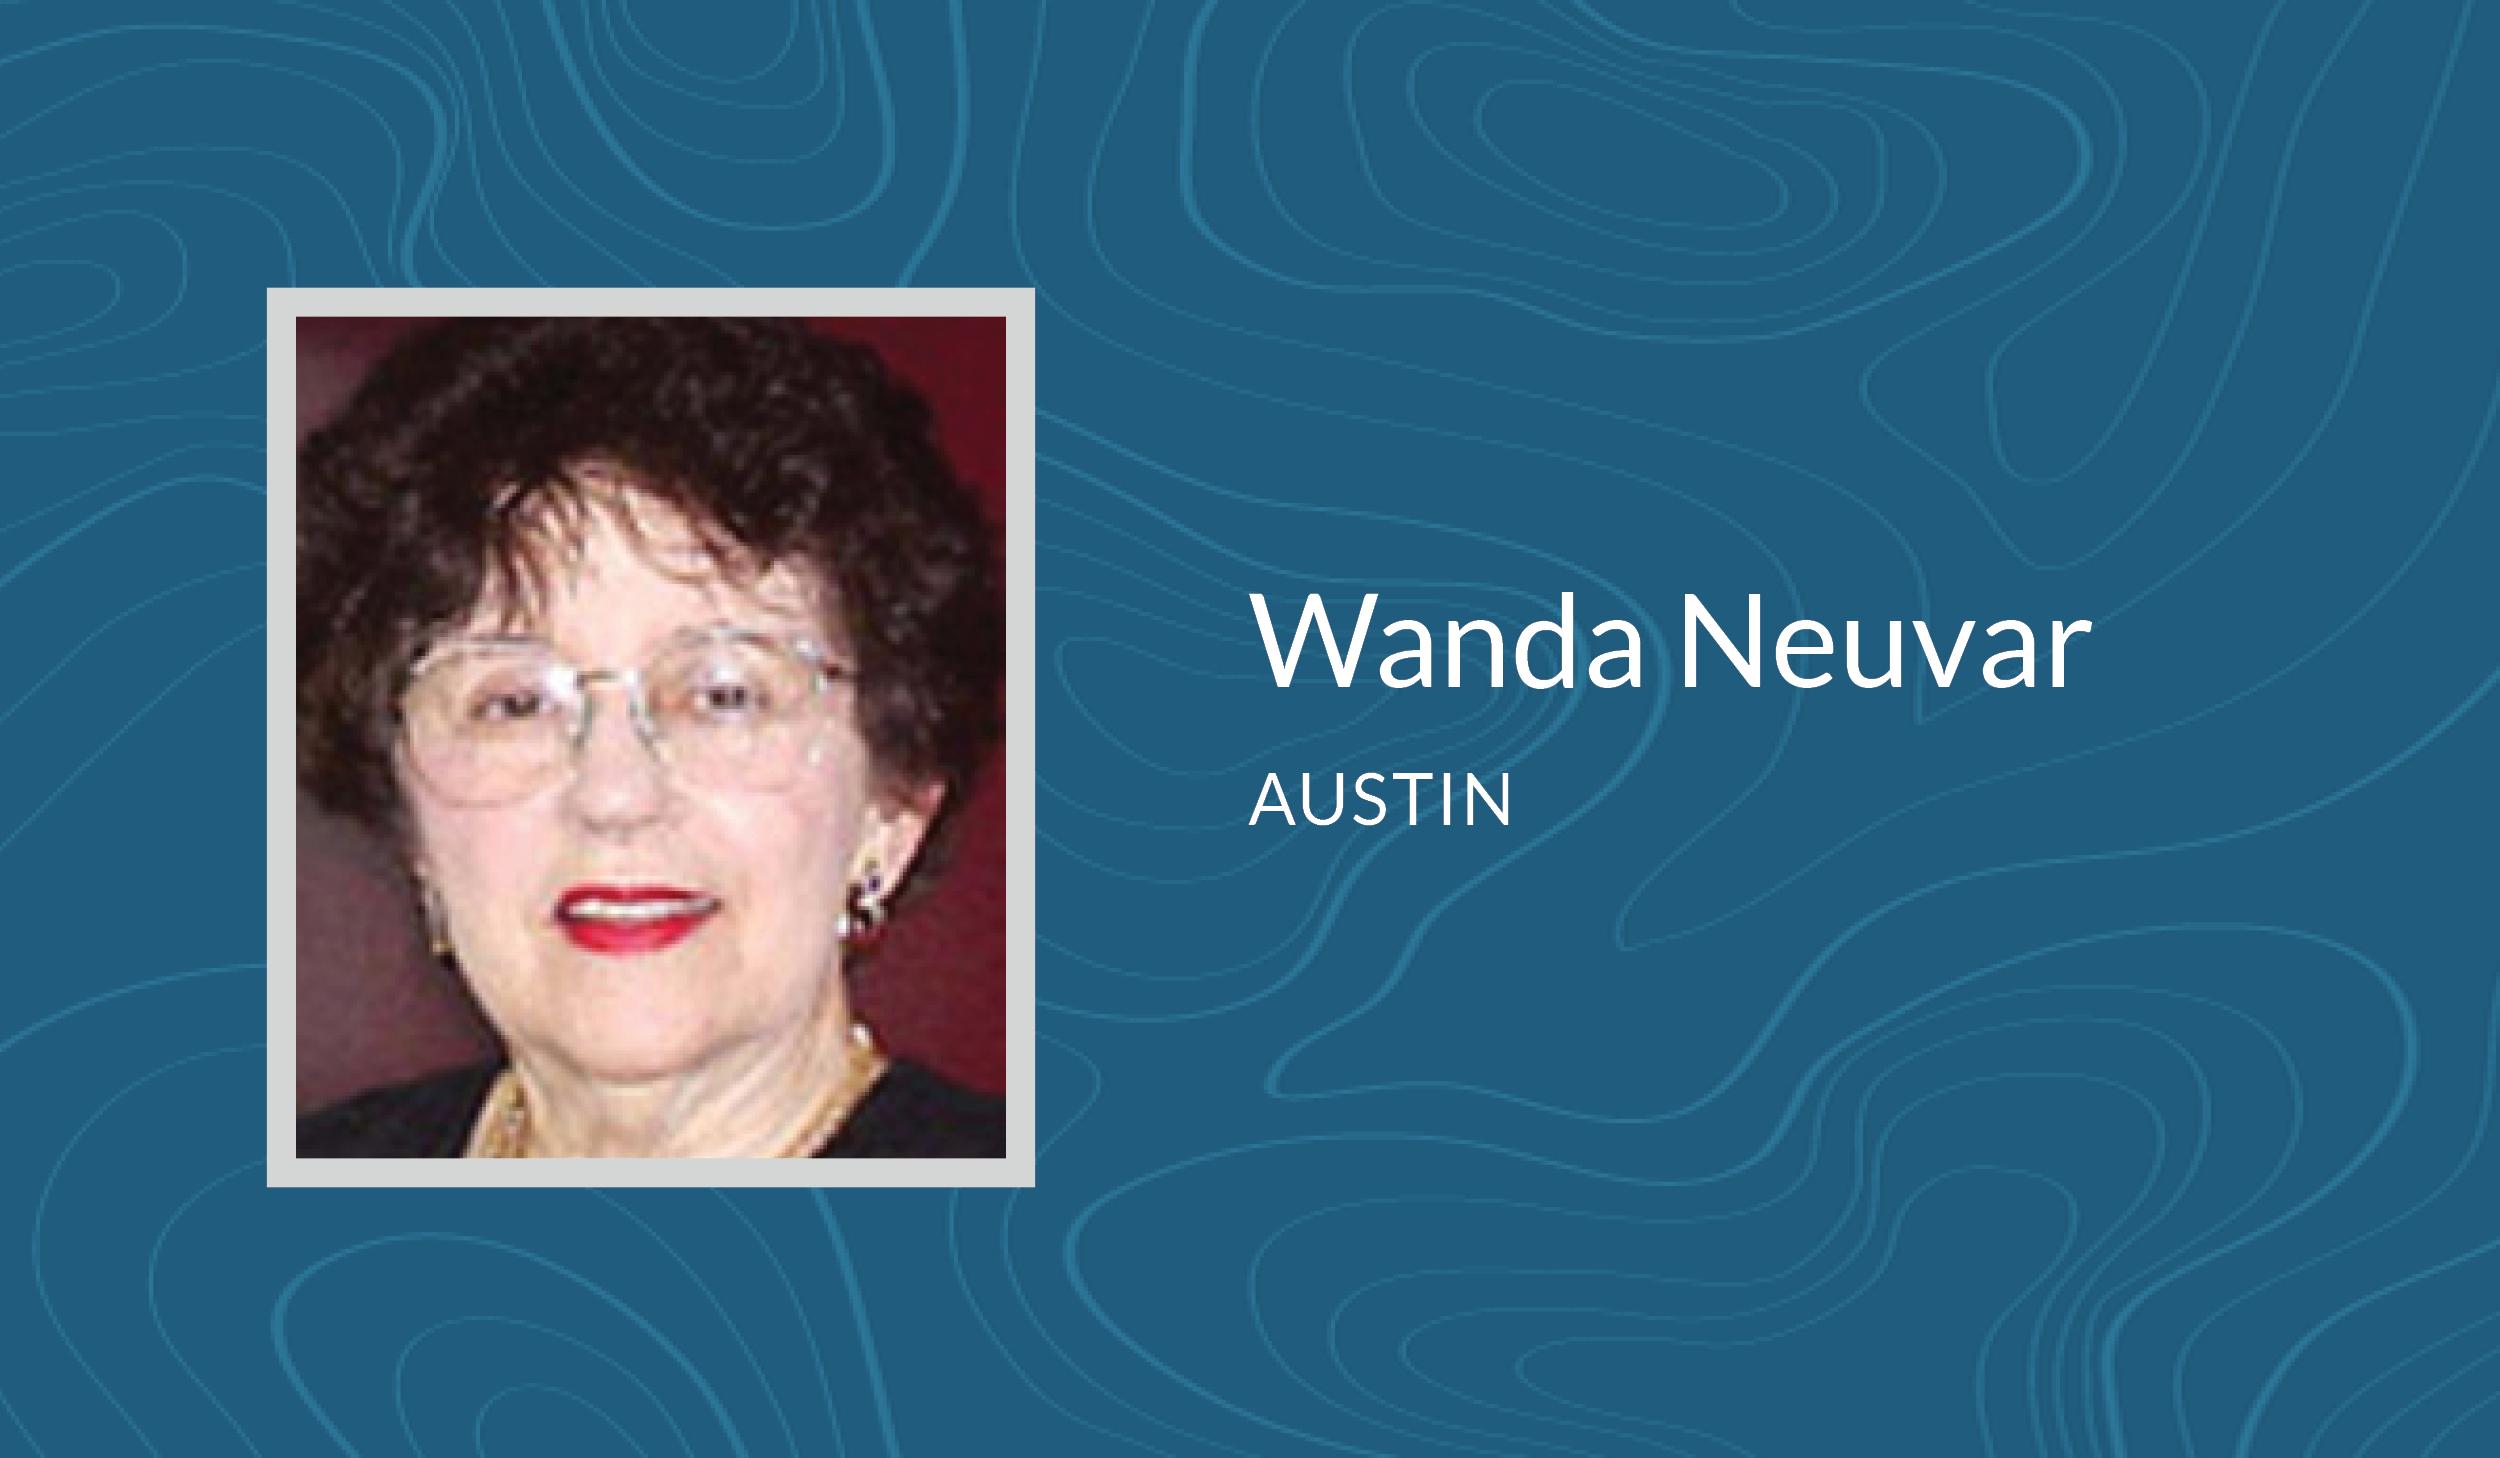 Wanda Neuvar Landing Page Headers.png